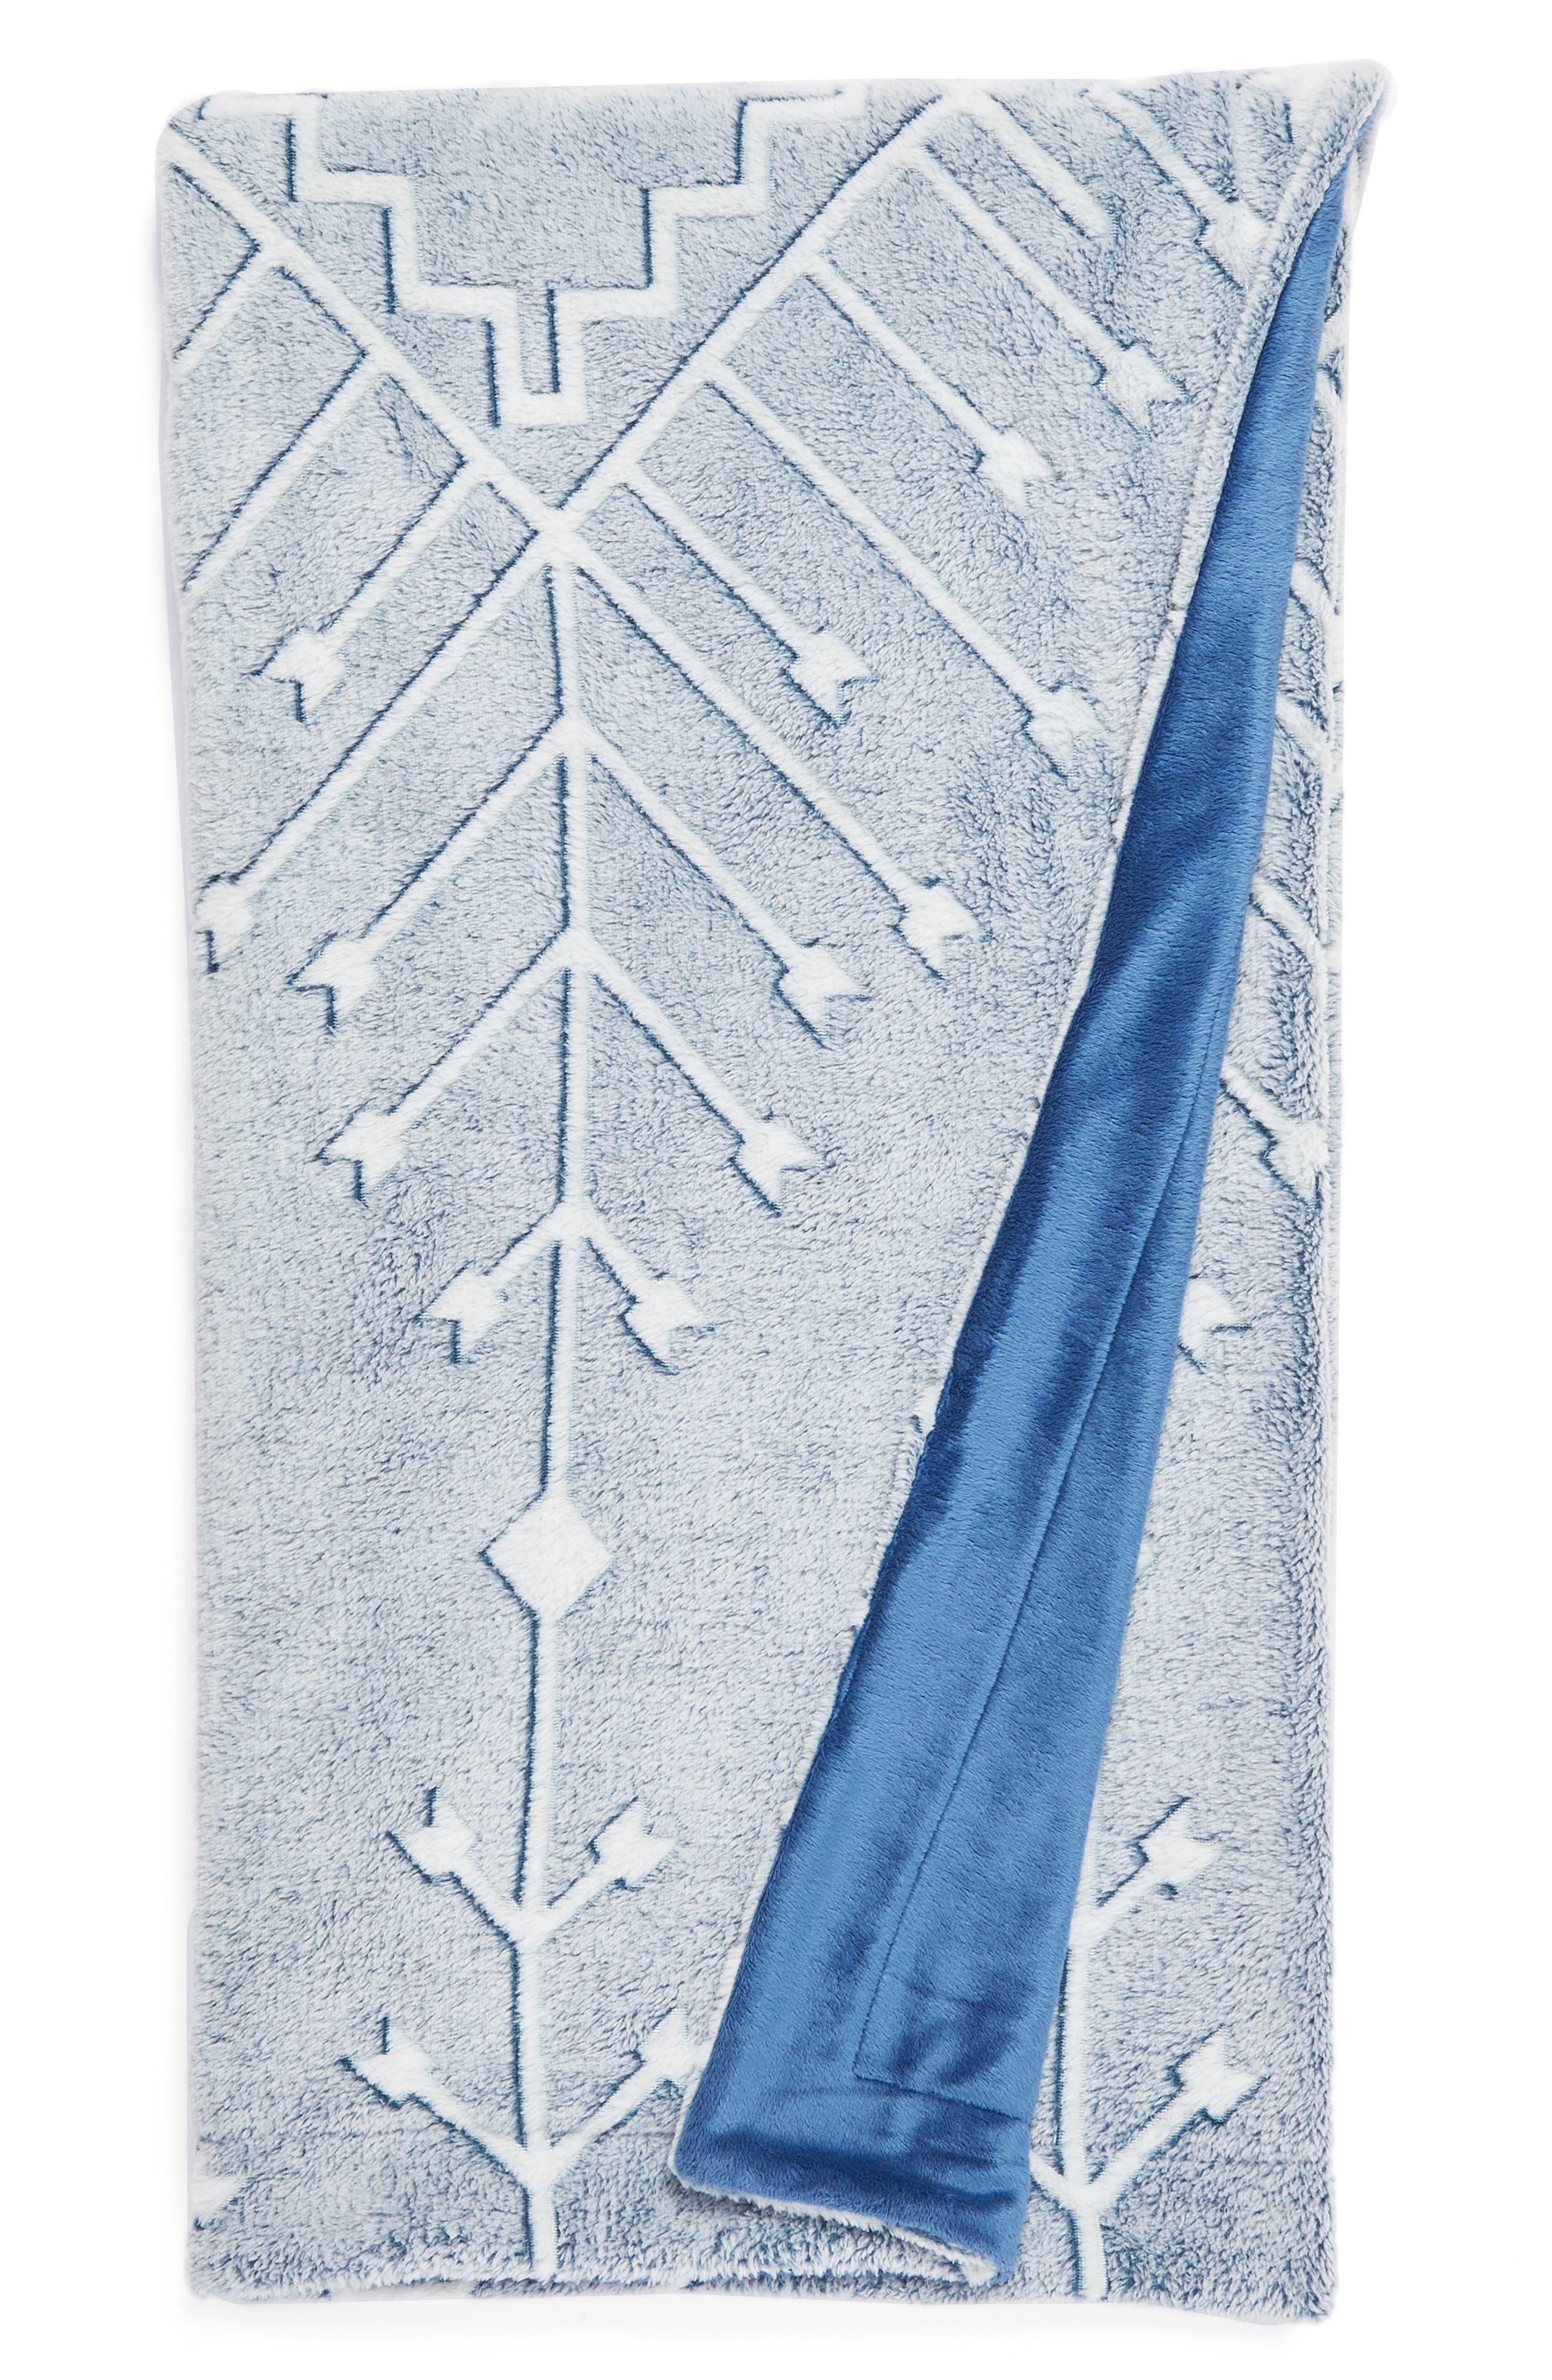 Nordstrom at Home Kilim Plush Jacquard Throw Blanket